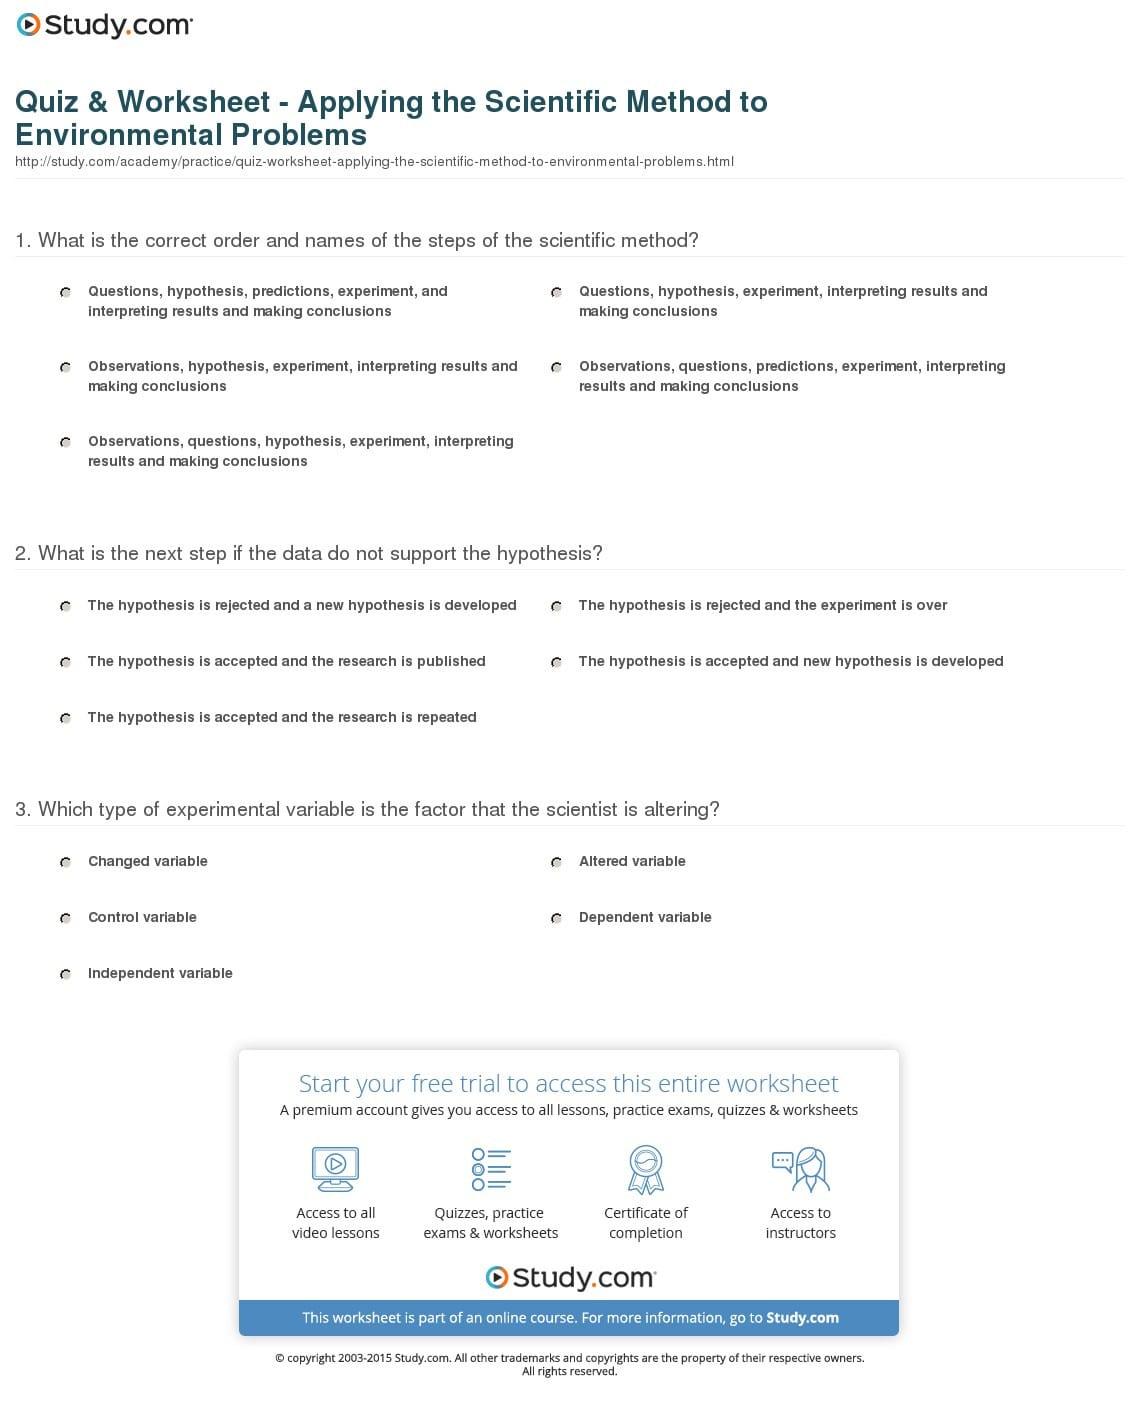 Quiz Worksheet Applying The Scientific Method To